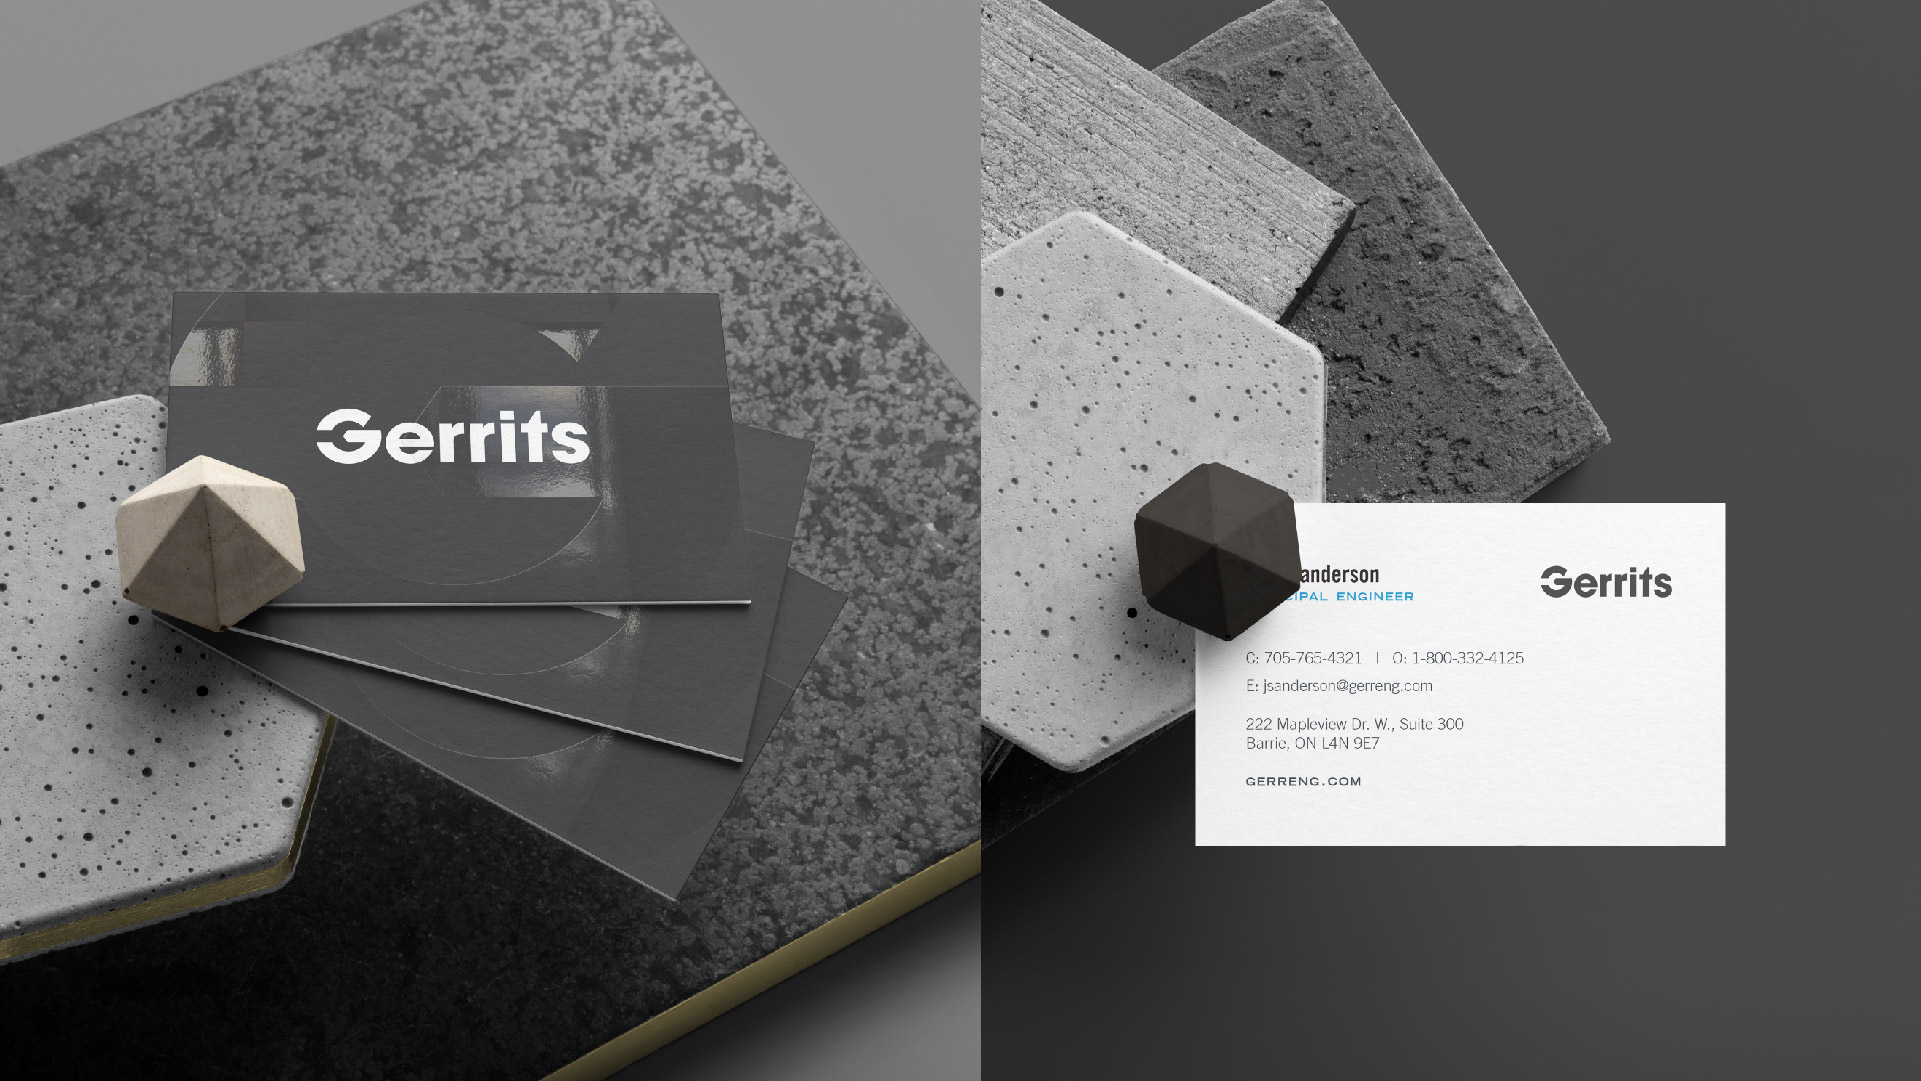 gerrits engineering business card design mockup